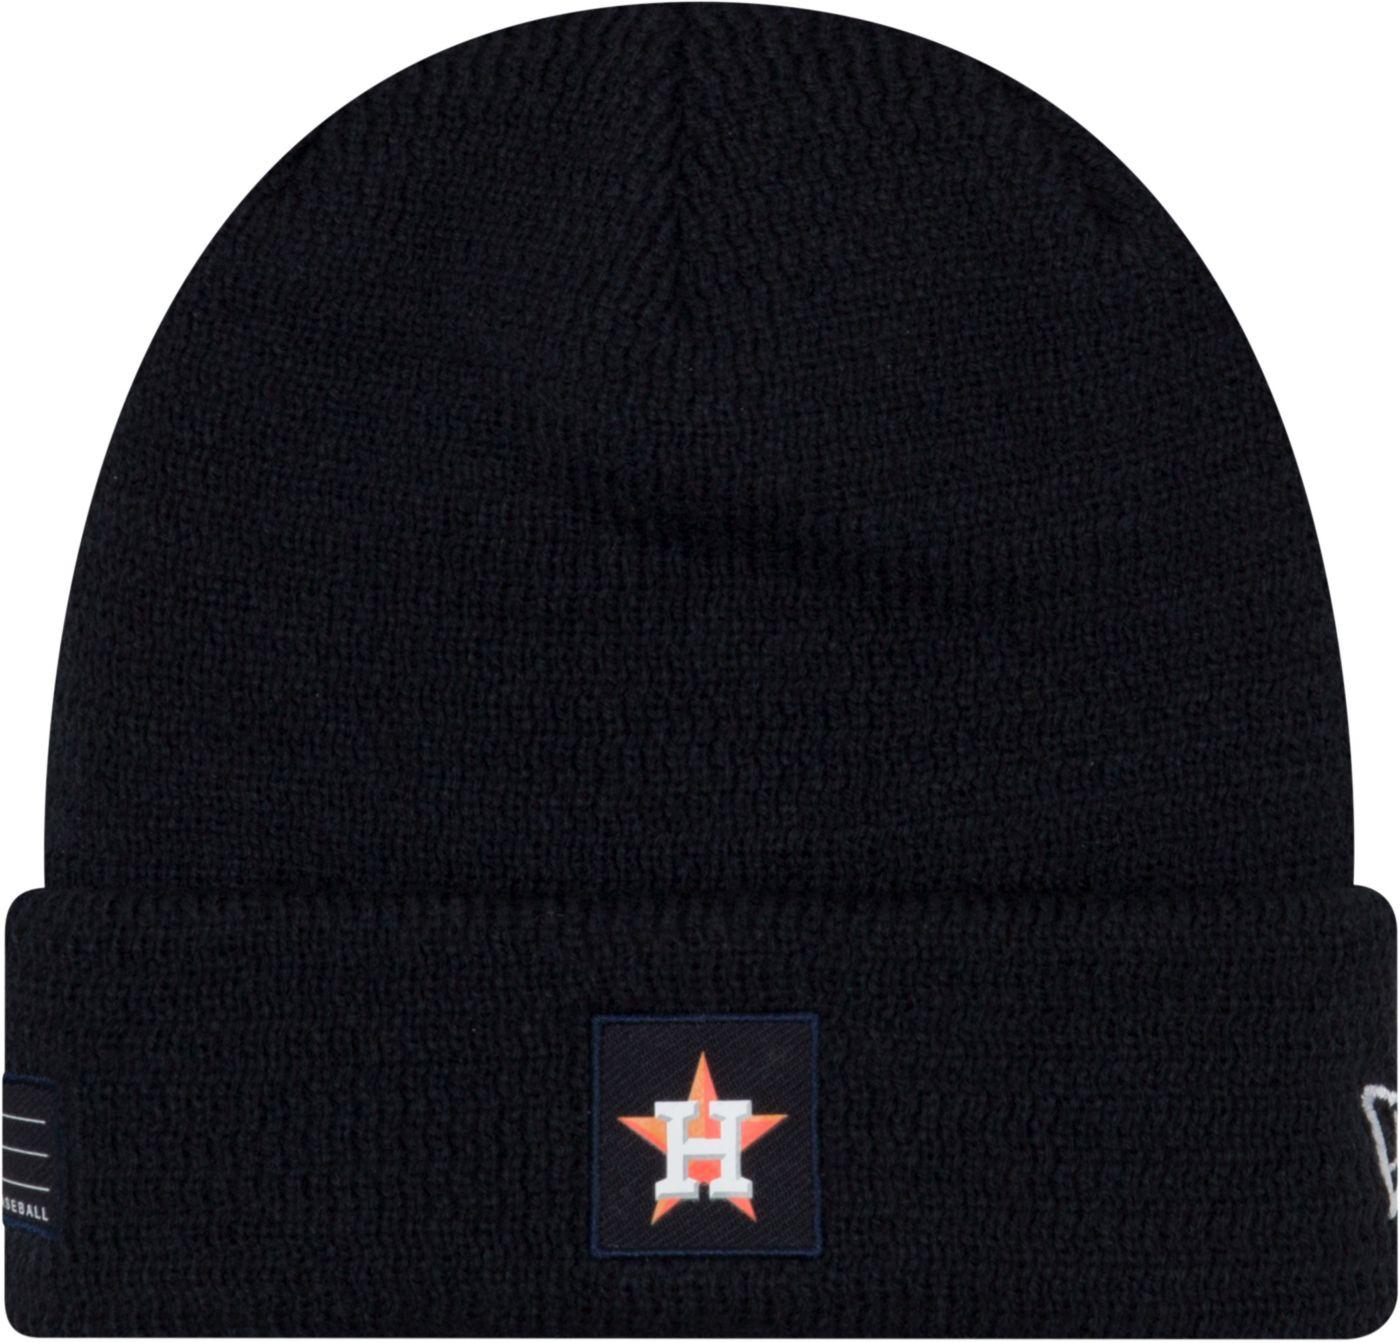 New Era Men's Houston Astros Clubhouse Knit Hat